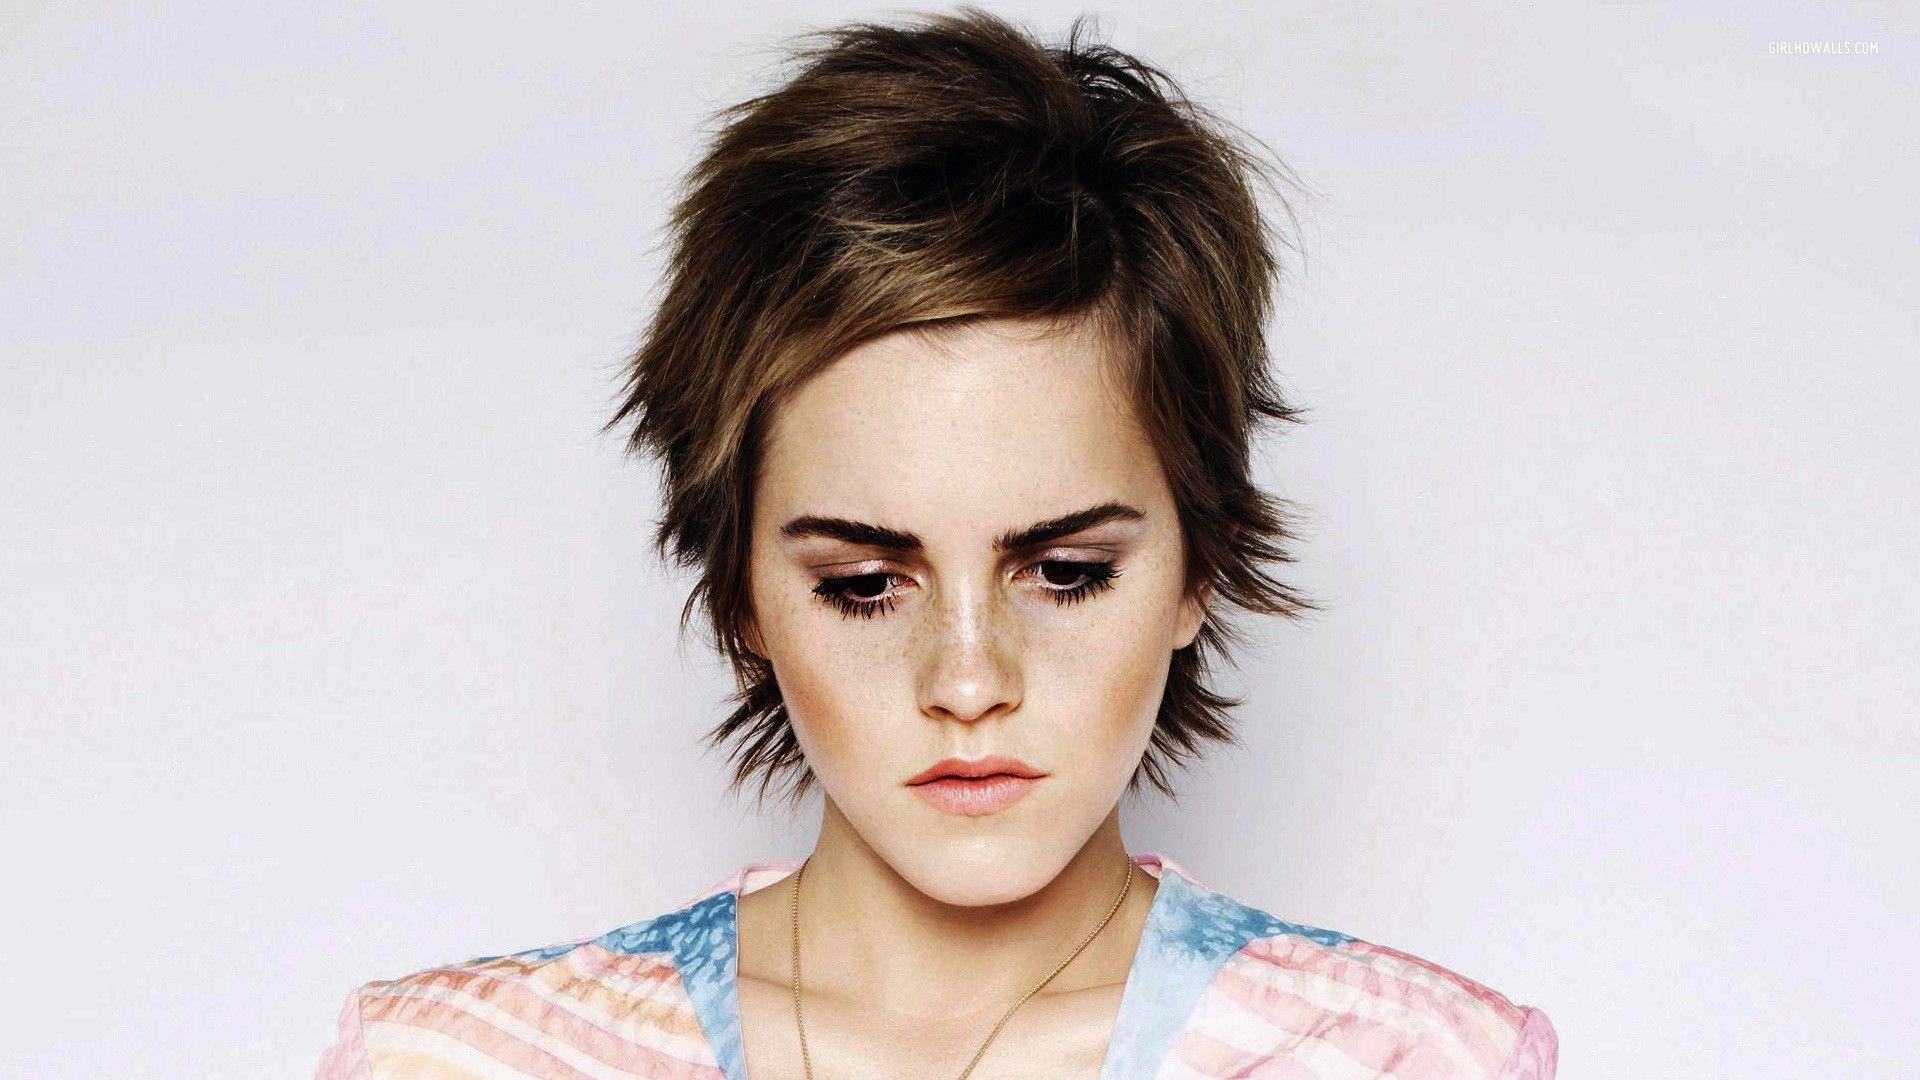 Pin by Rajnish Kumar on Emma Watson in 2019 Short hair